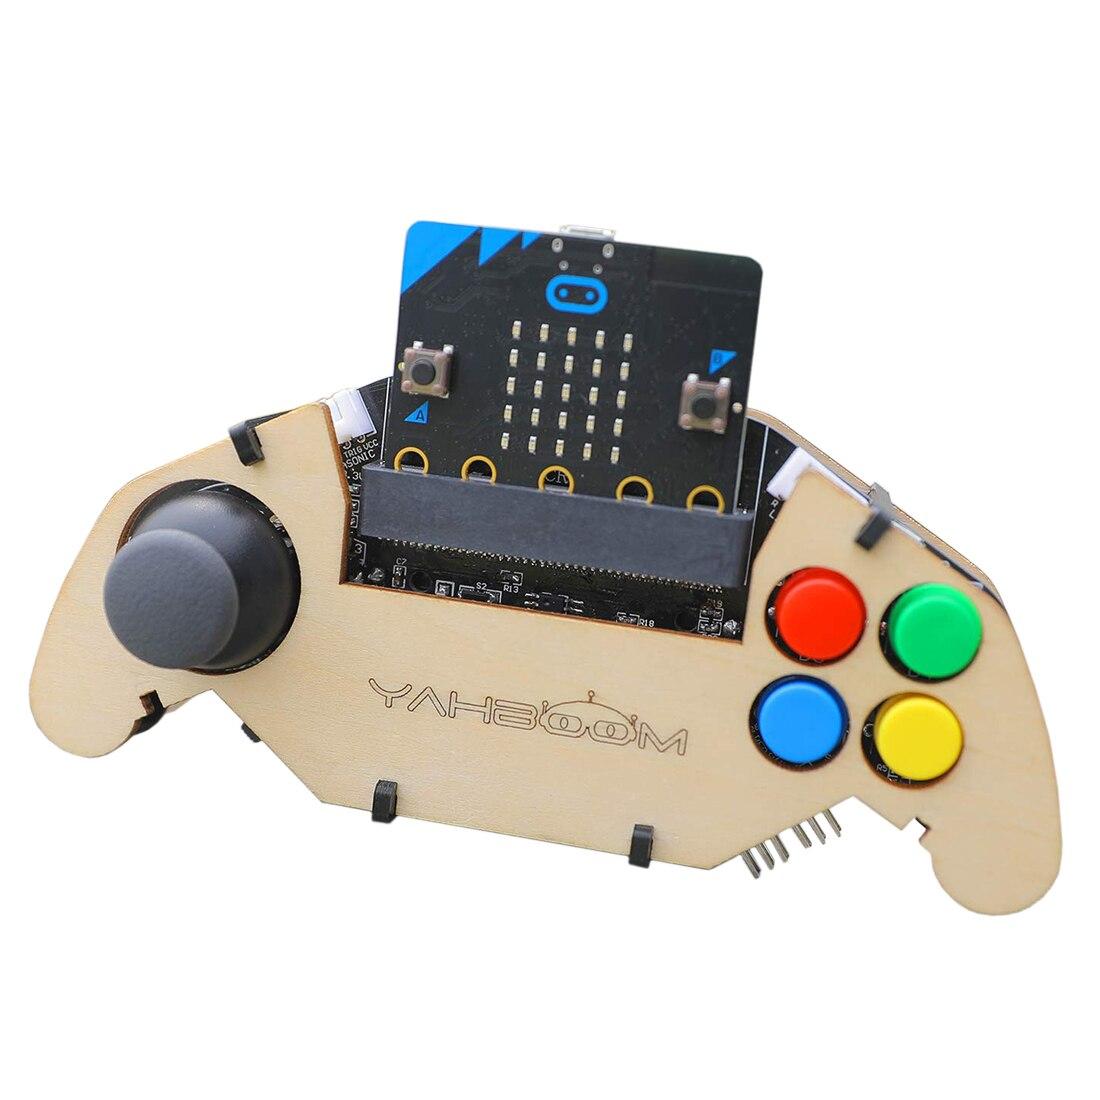 Micro:Bit Gamepad Expansion Board Handle Microbit Robot Car Joystick STEM Toys Kids Boys Programming Toy Game Controller